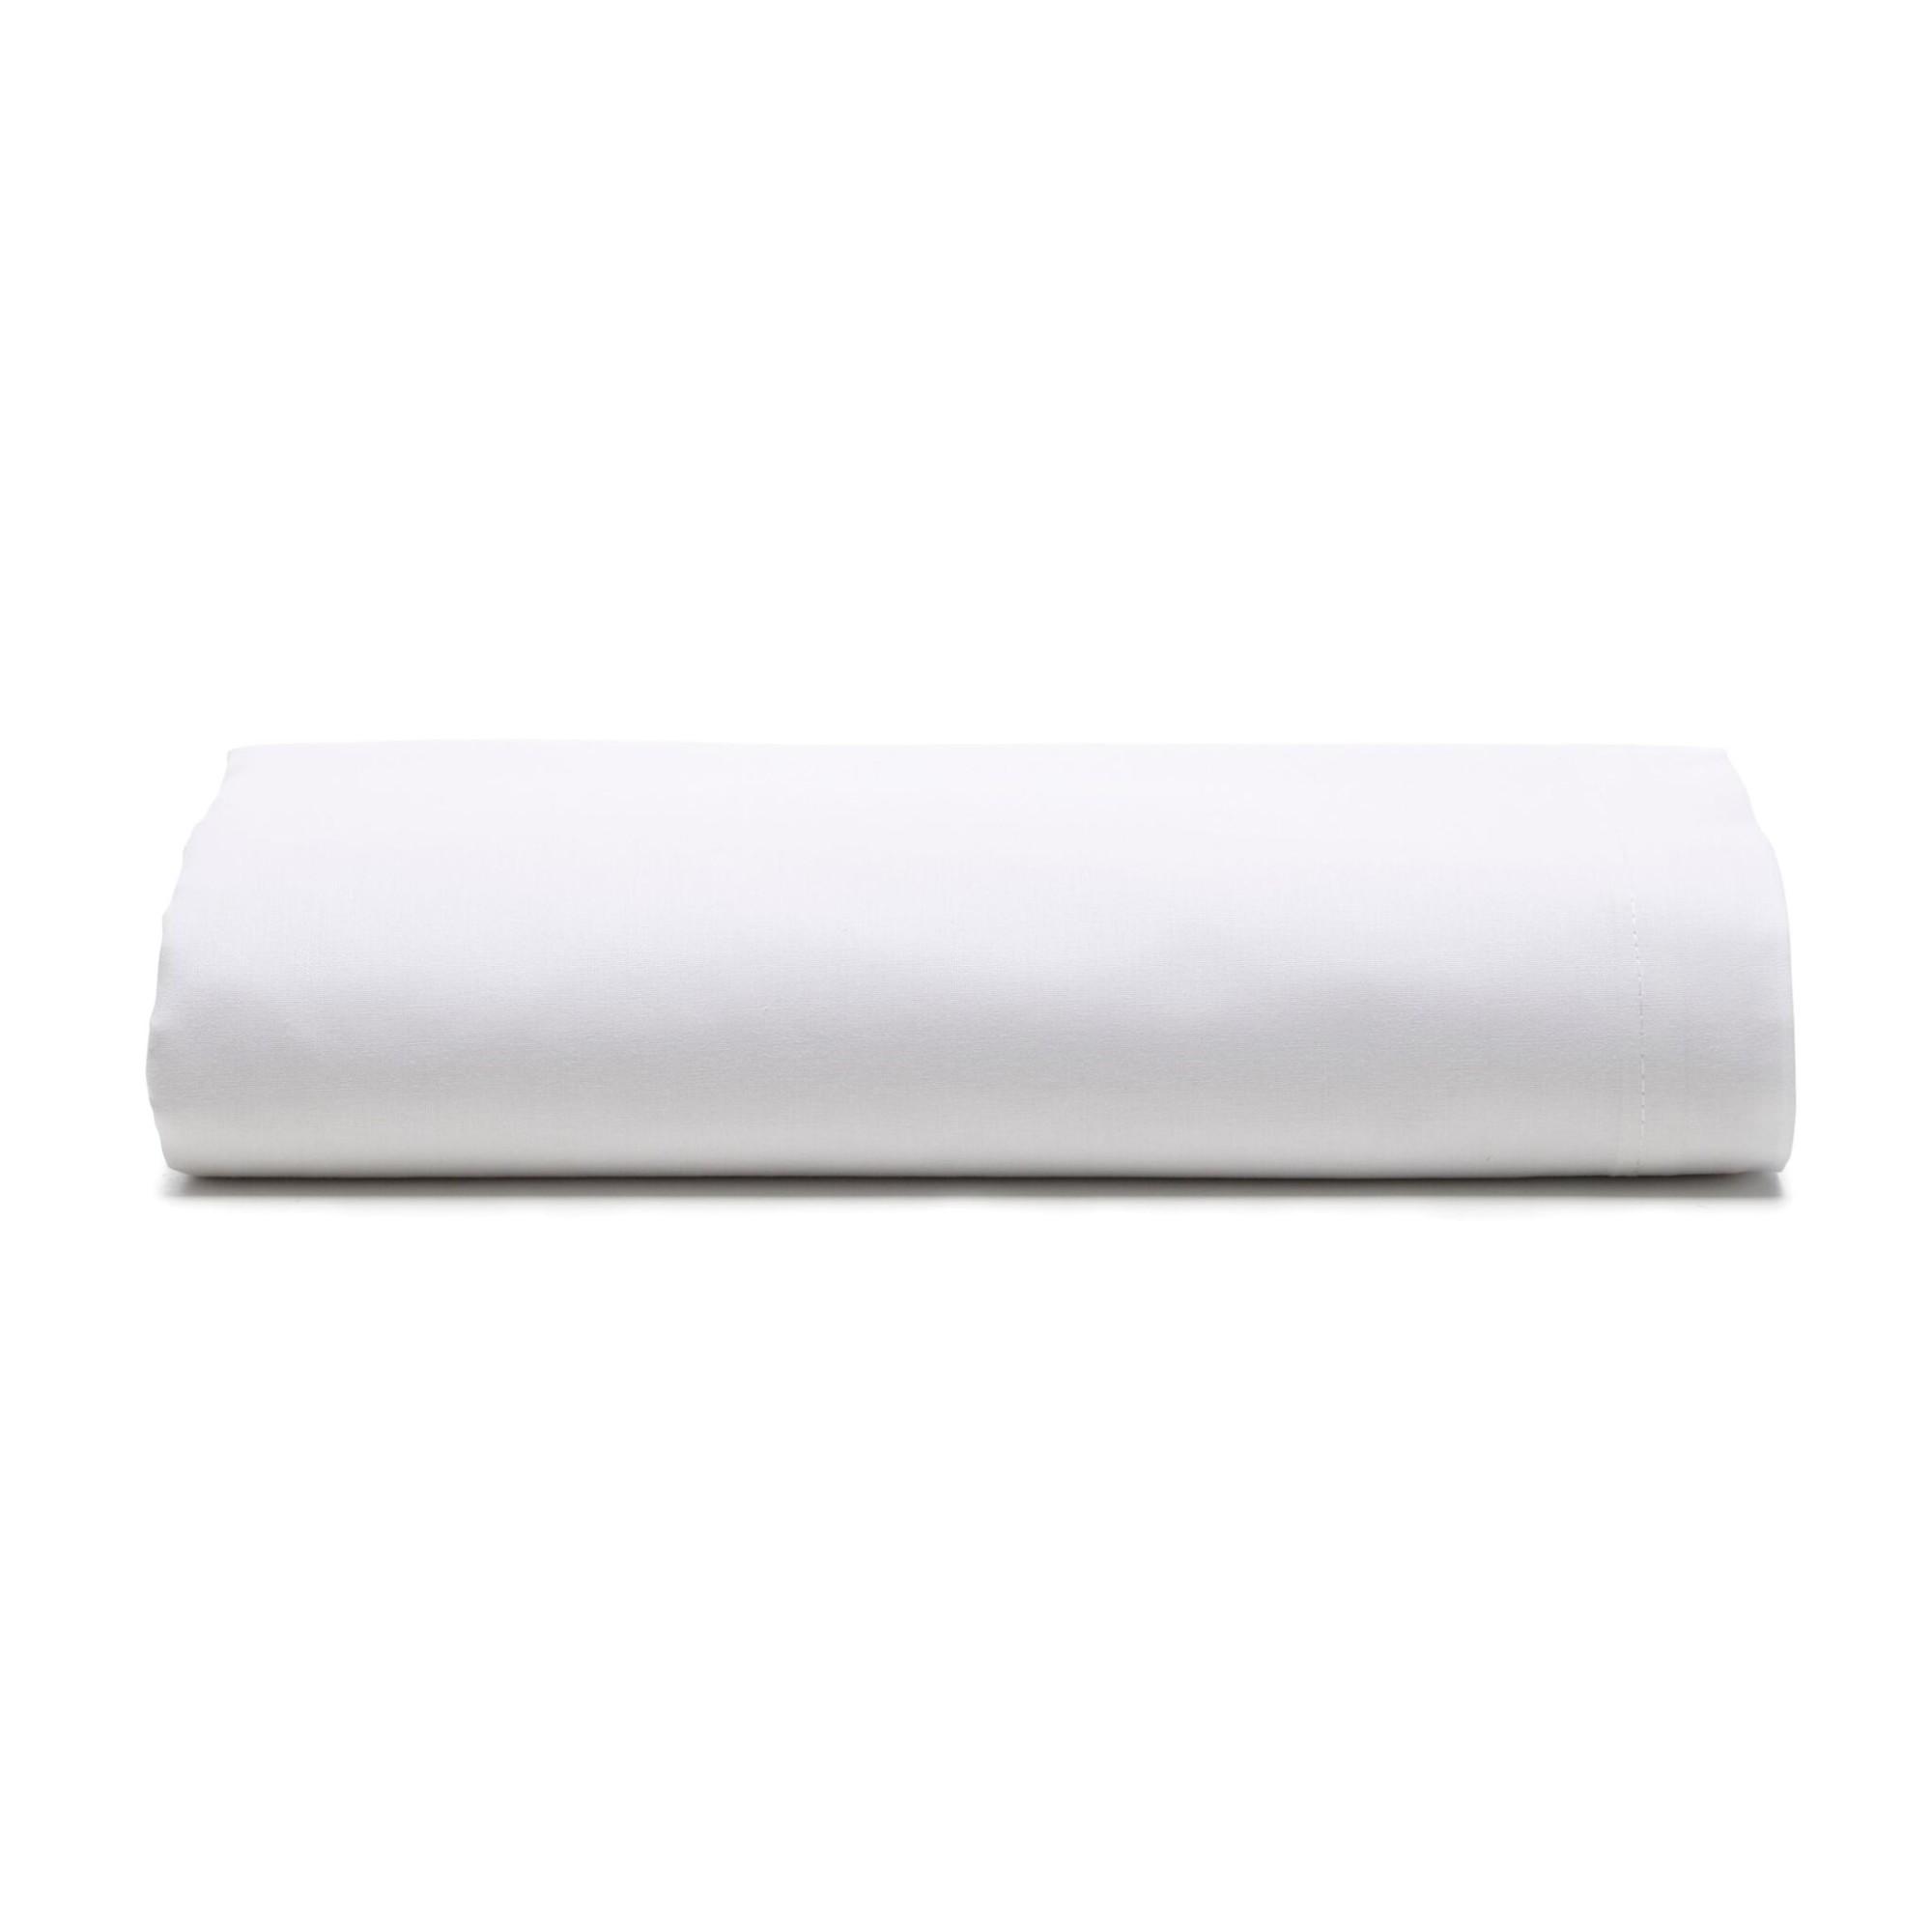 Lencol Casal Prata sem Elastico 100 Algodao Branco - Santista